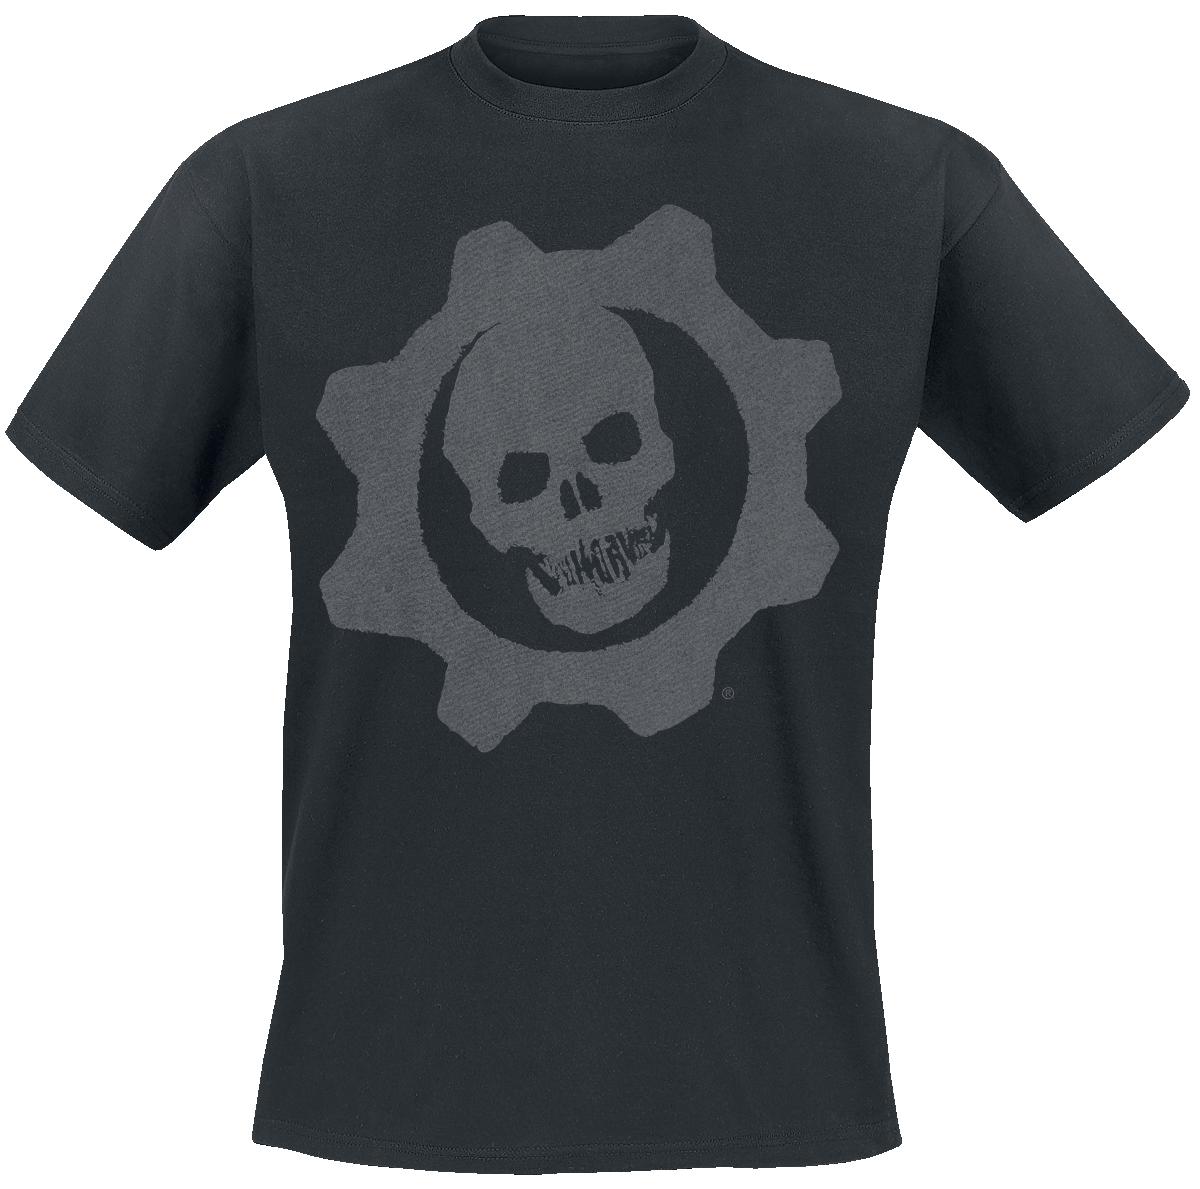 Gears - 5 - Omen - T-Shirt - black image